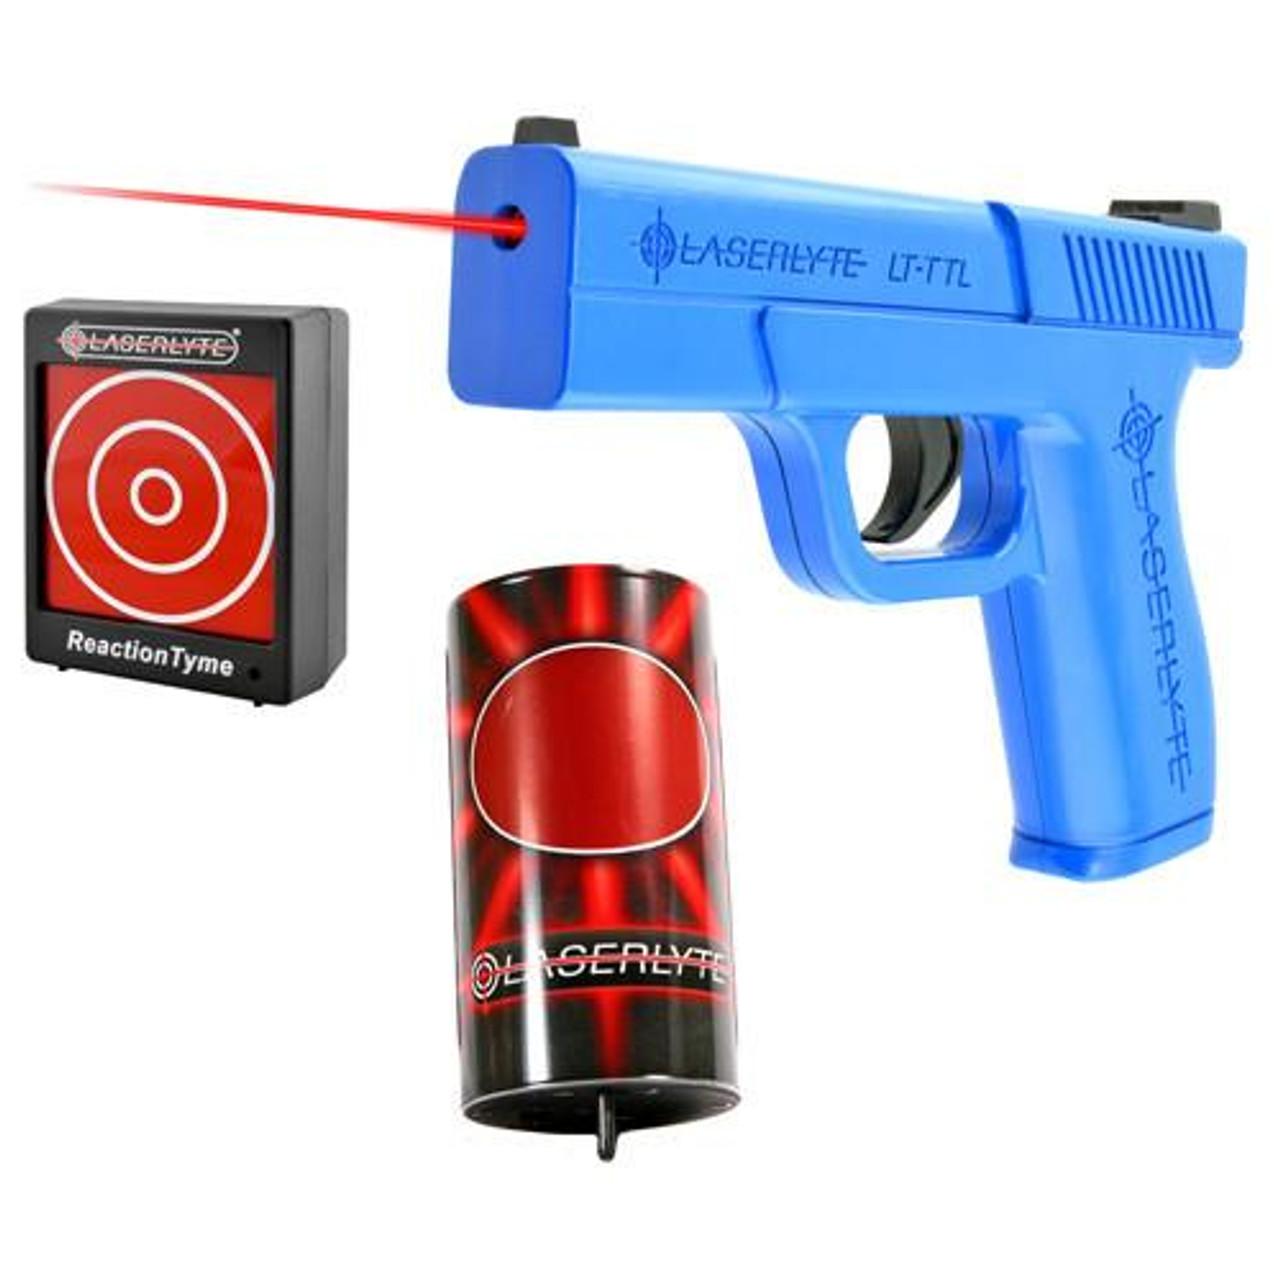 LaserLyte Laser Combo Kit: 1 Can, 1 Reaction Time Target, Laser Pistol